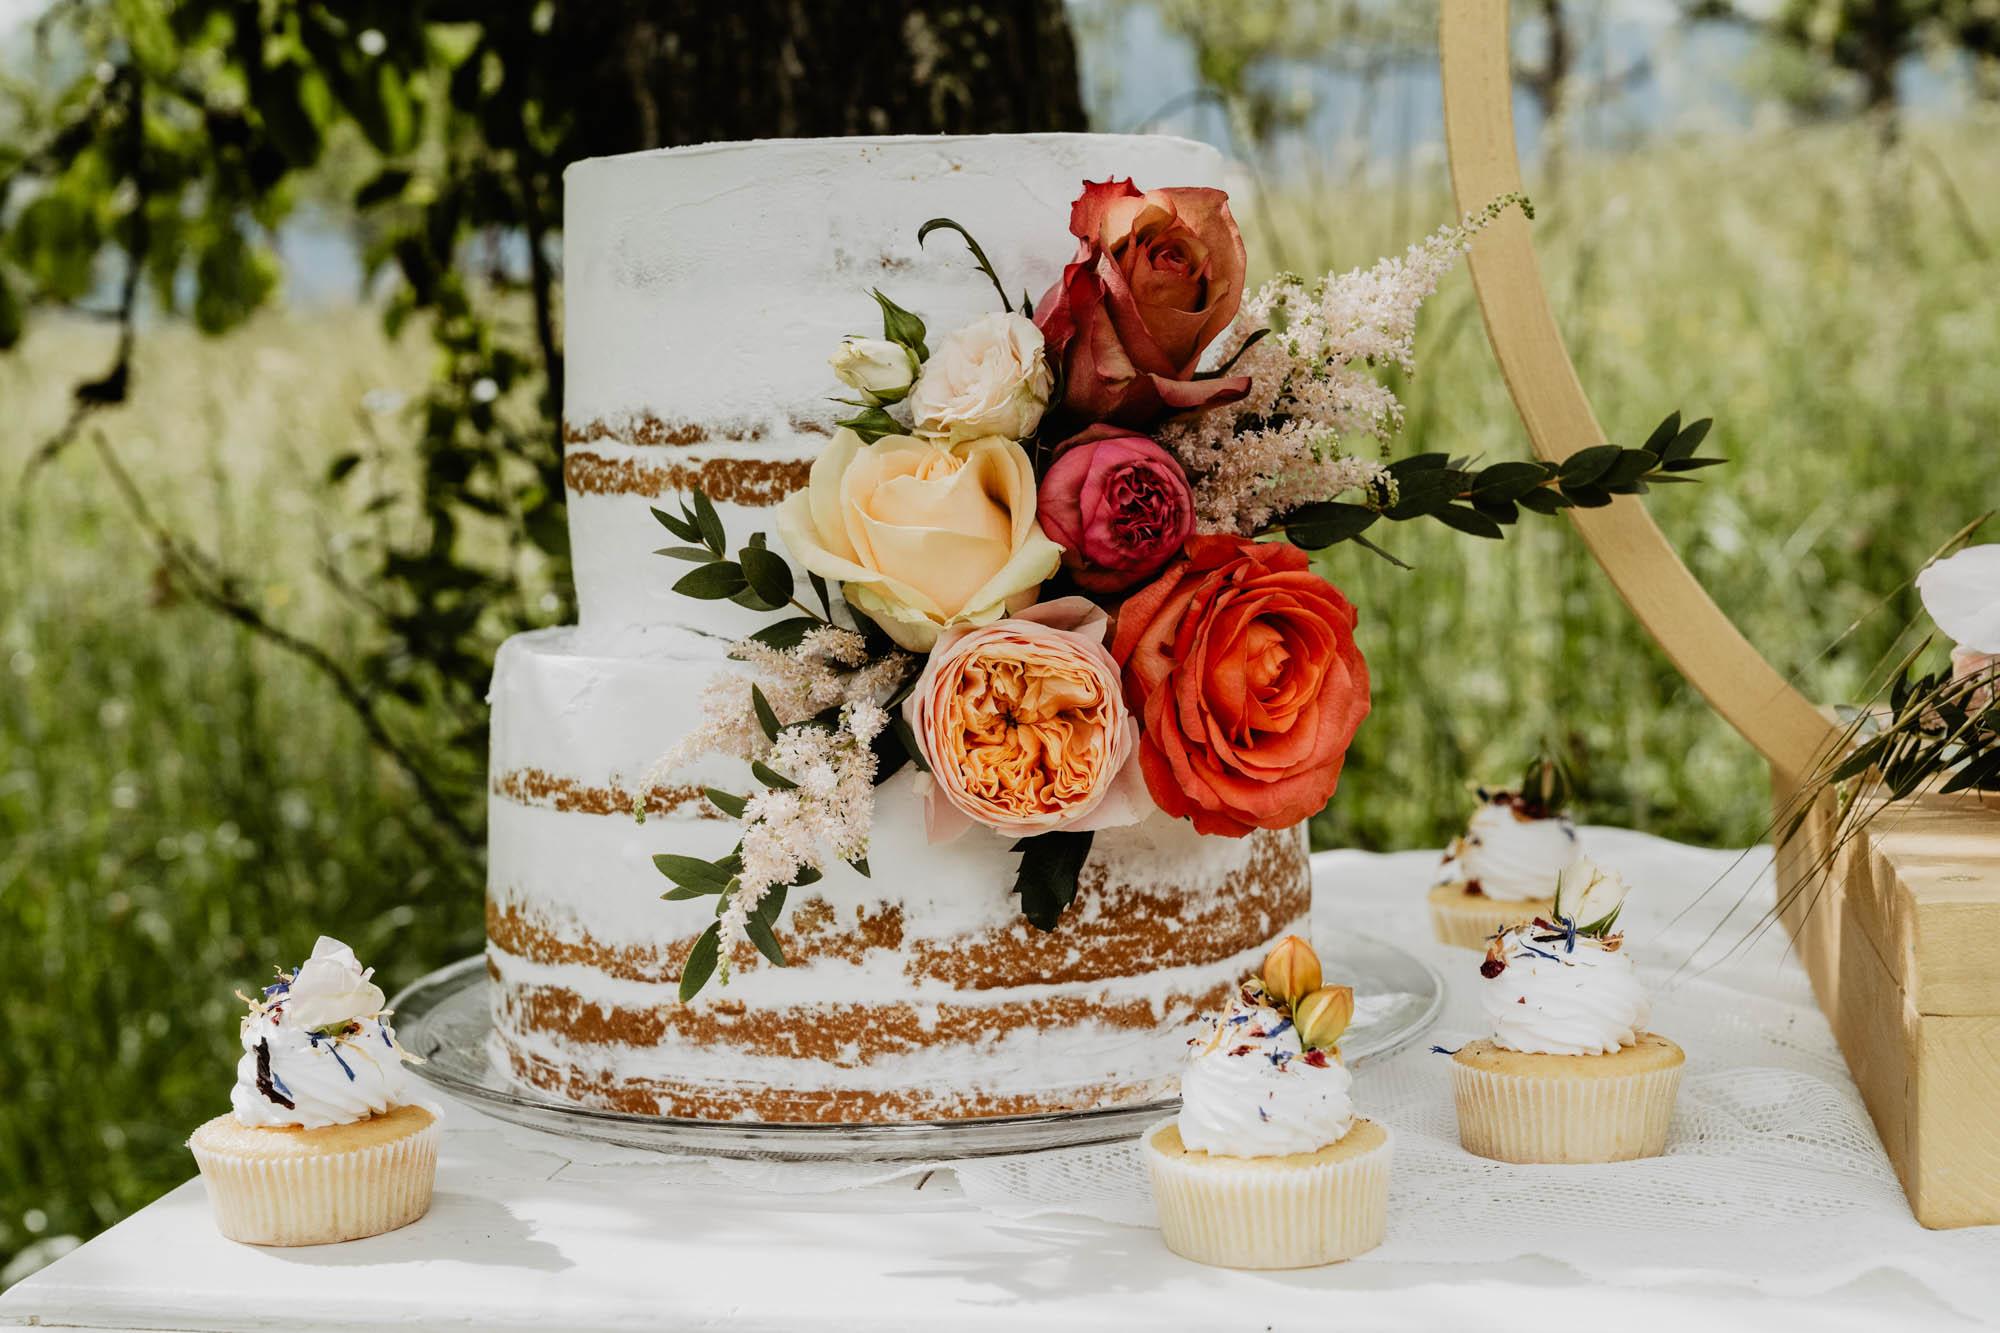 Olivia Cake Designs